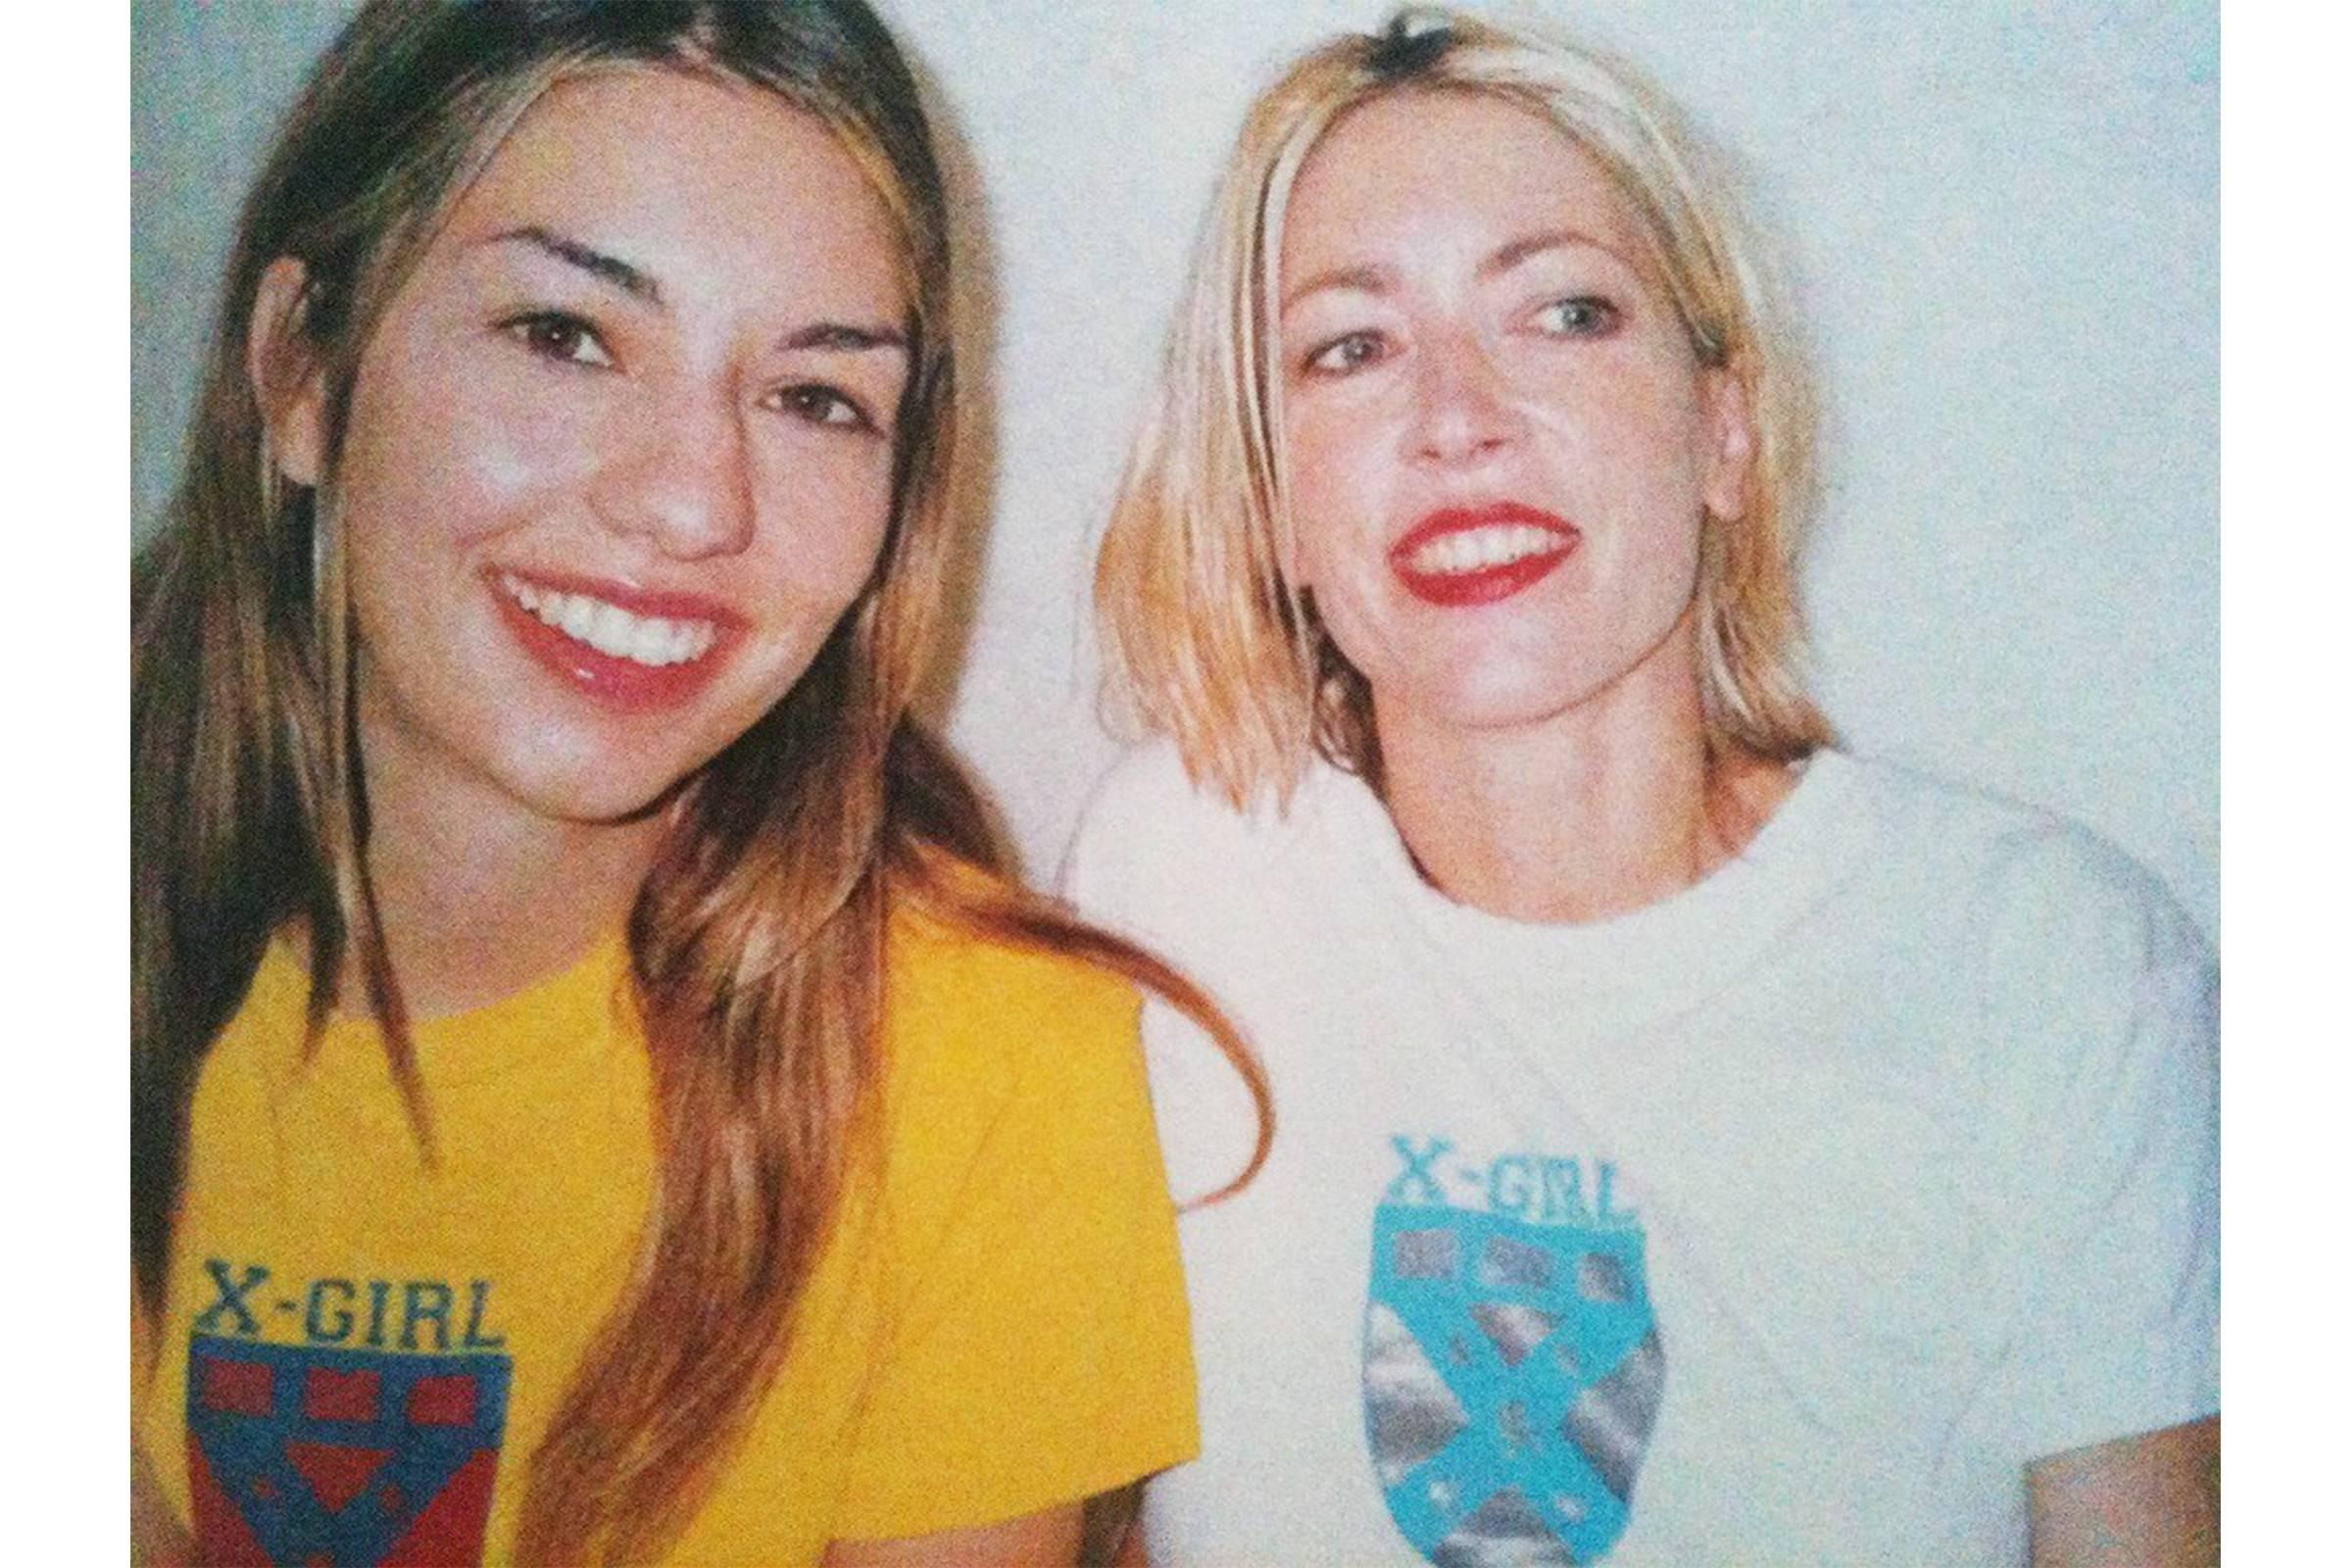 X-Girl - Sophia Coppola and Kim Gordon, 1990s. Photo: Takashi Homma